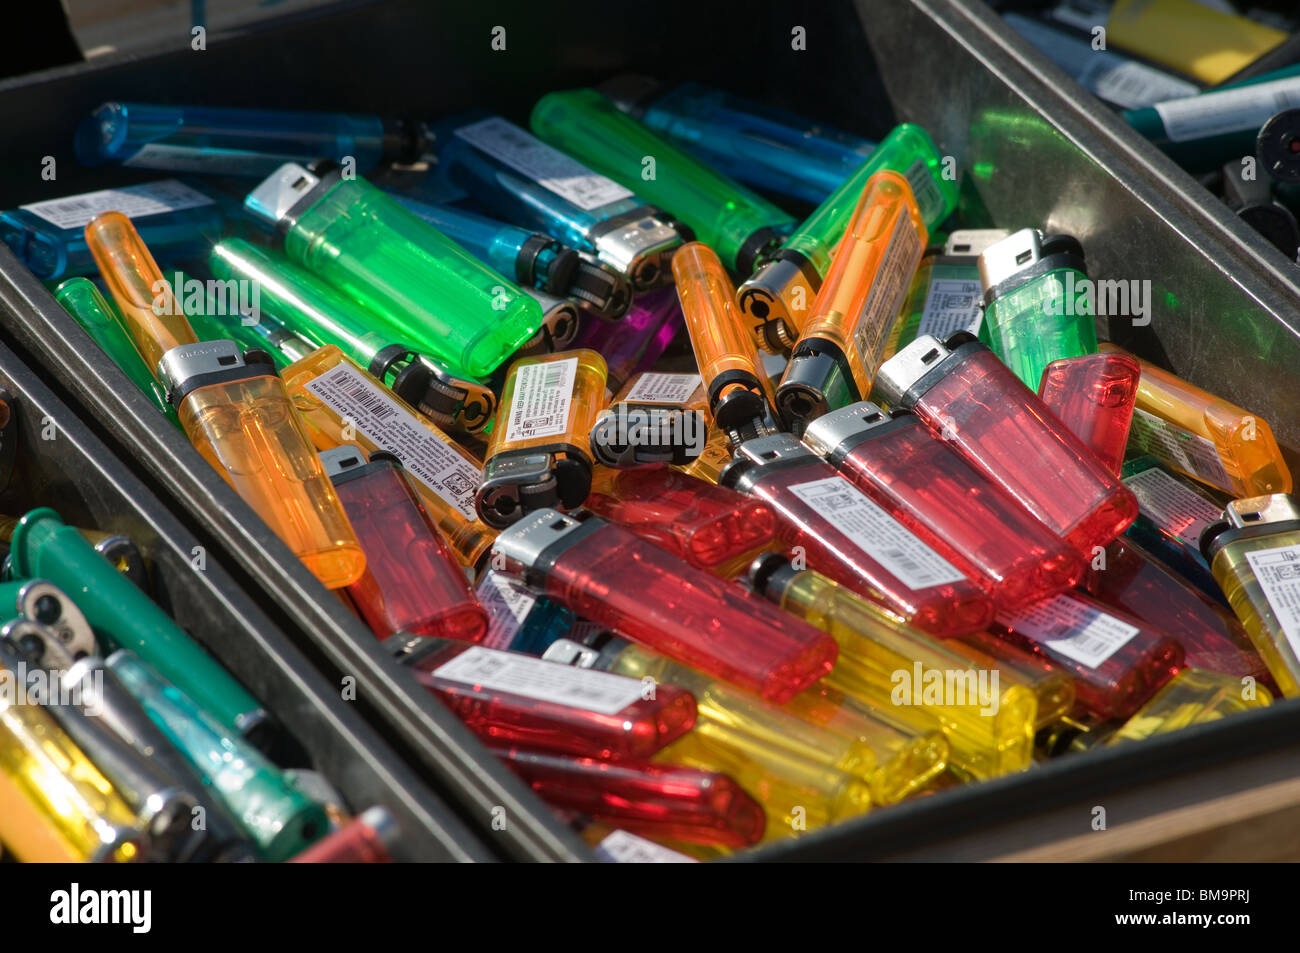 cigarette lighter lighters fag fags cigarettes plastic disposable bic gas flint flints throwaway throw away fire - Stock Image